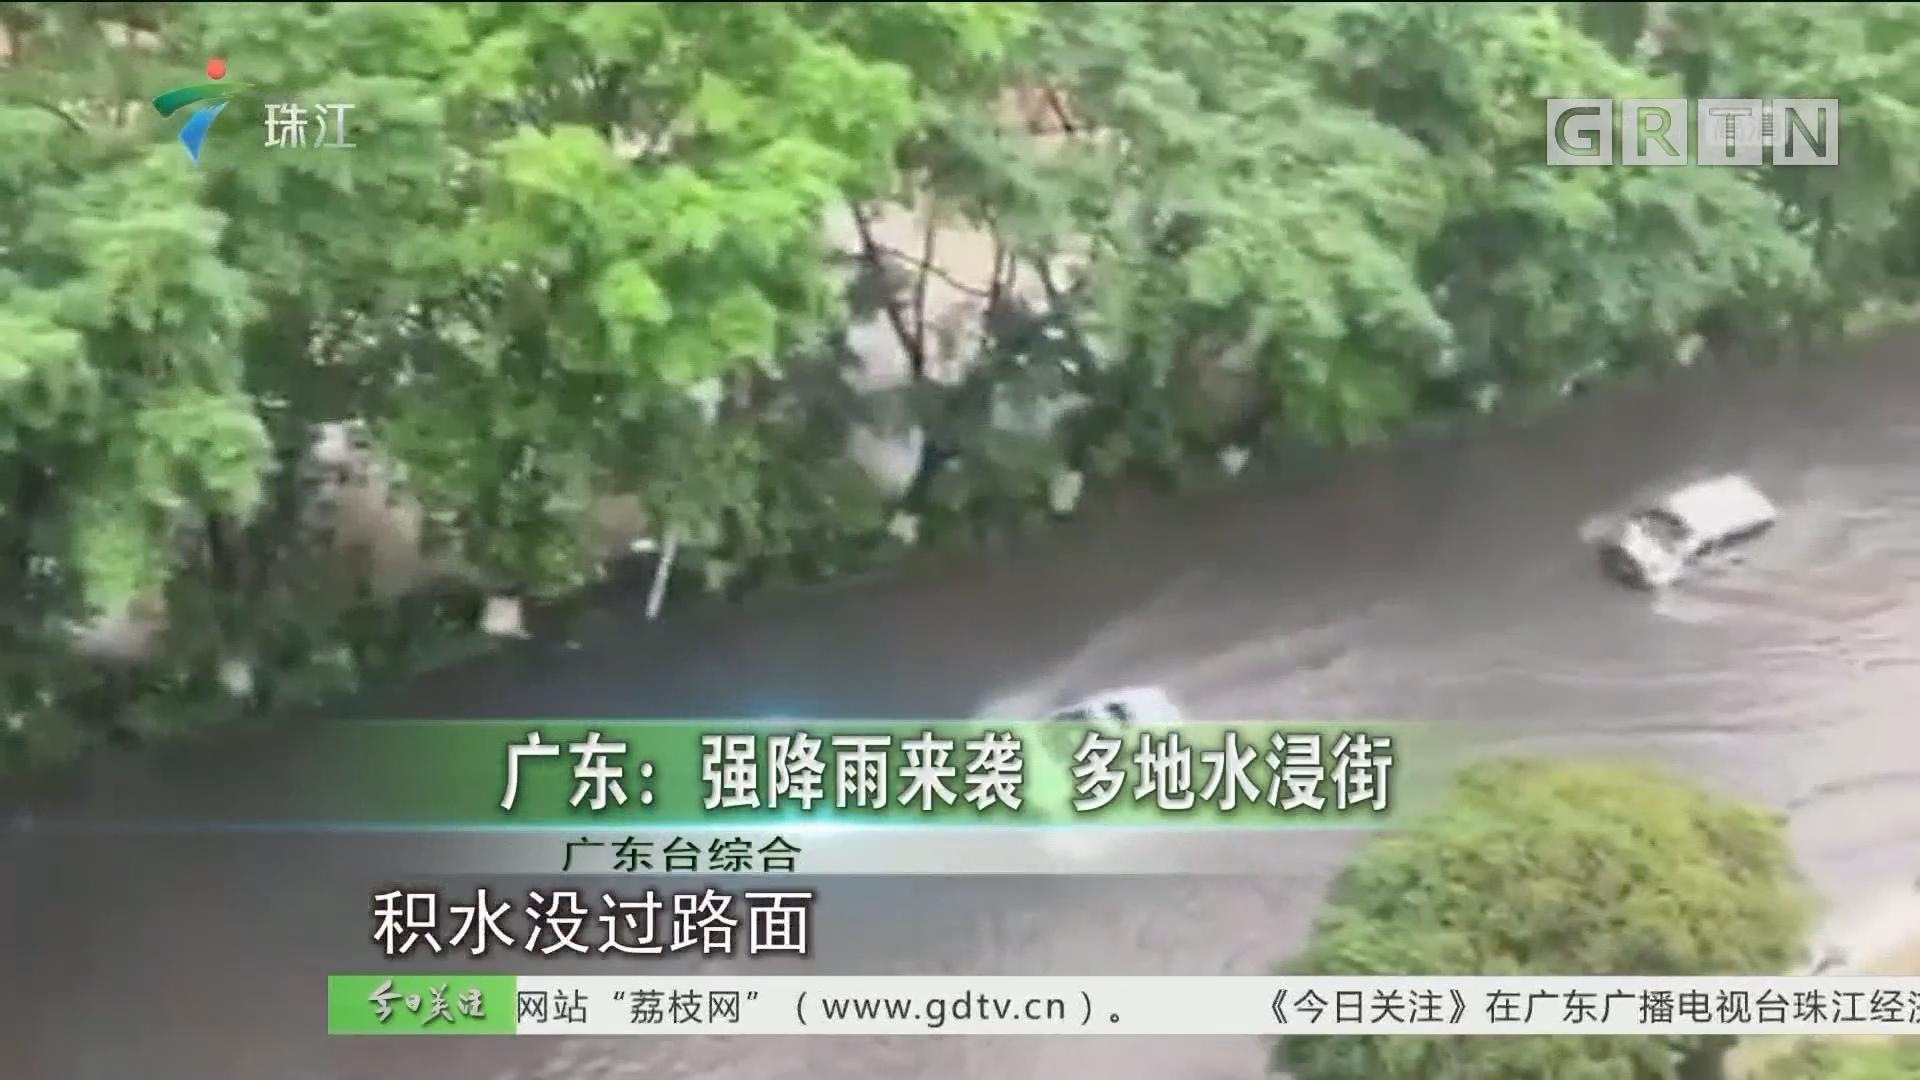 manbetx手机版 - 登陆:强降雨来袭 多地水浸街